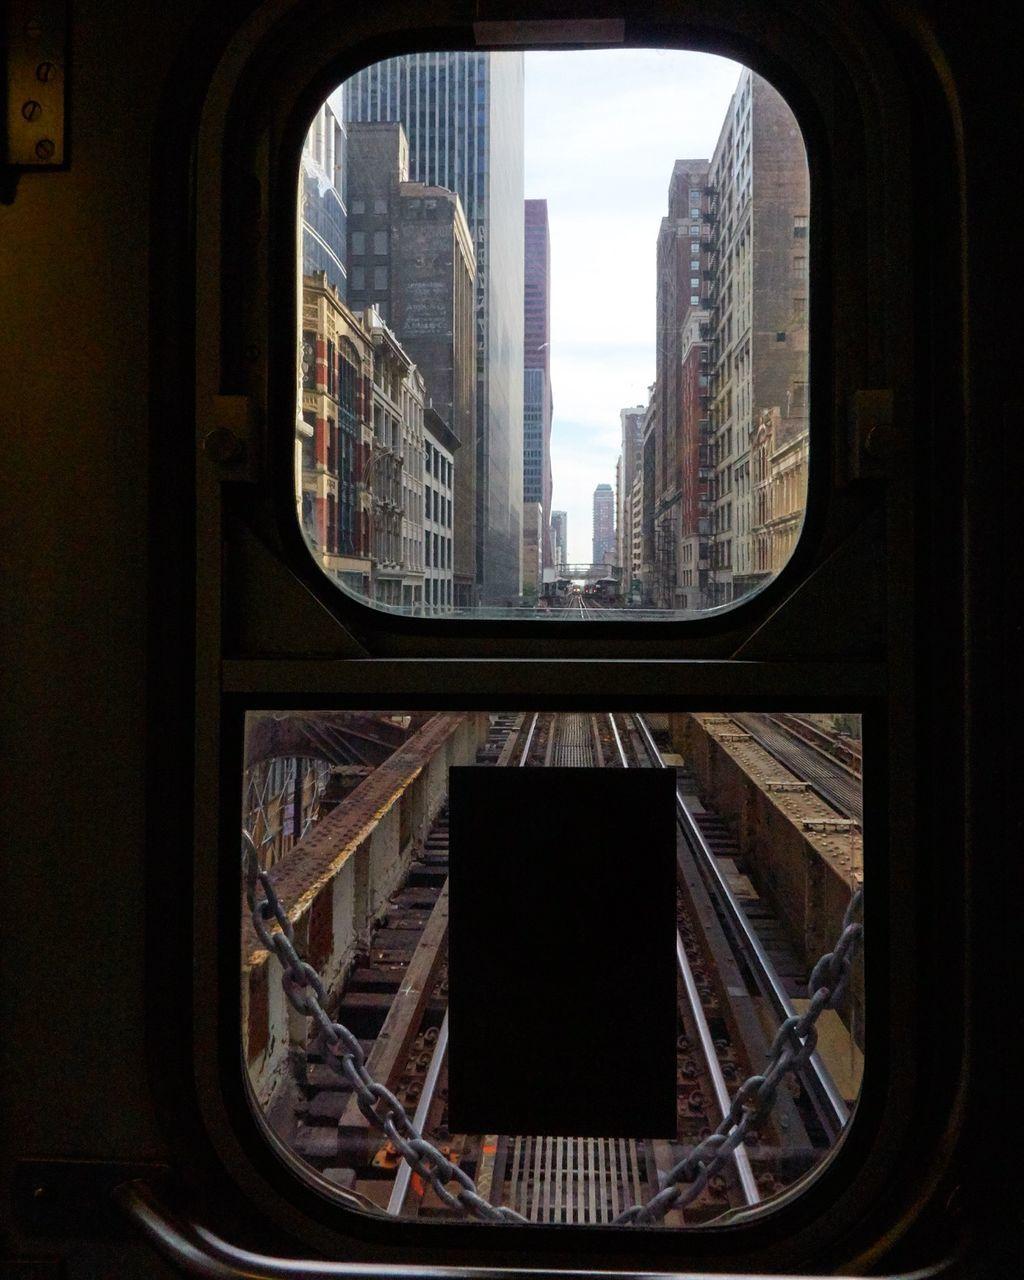 Buildings In City Seen Through Train Window